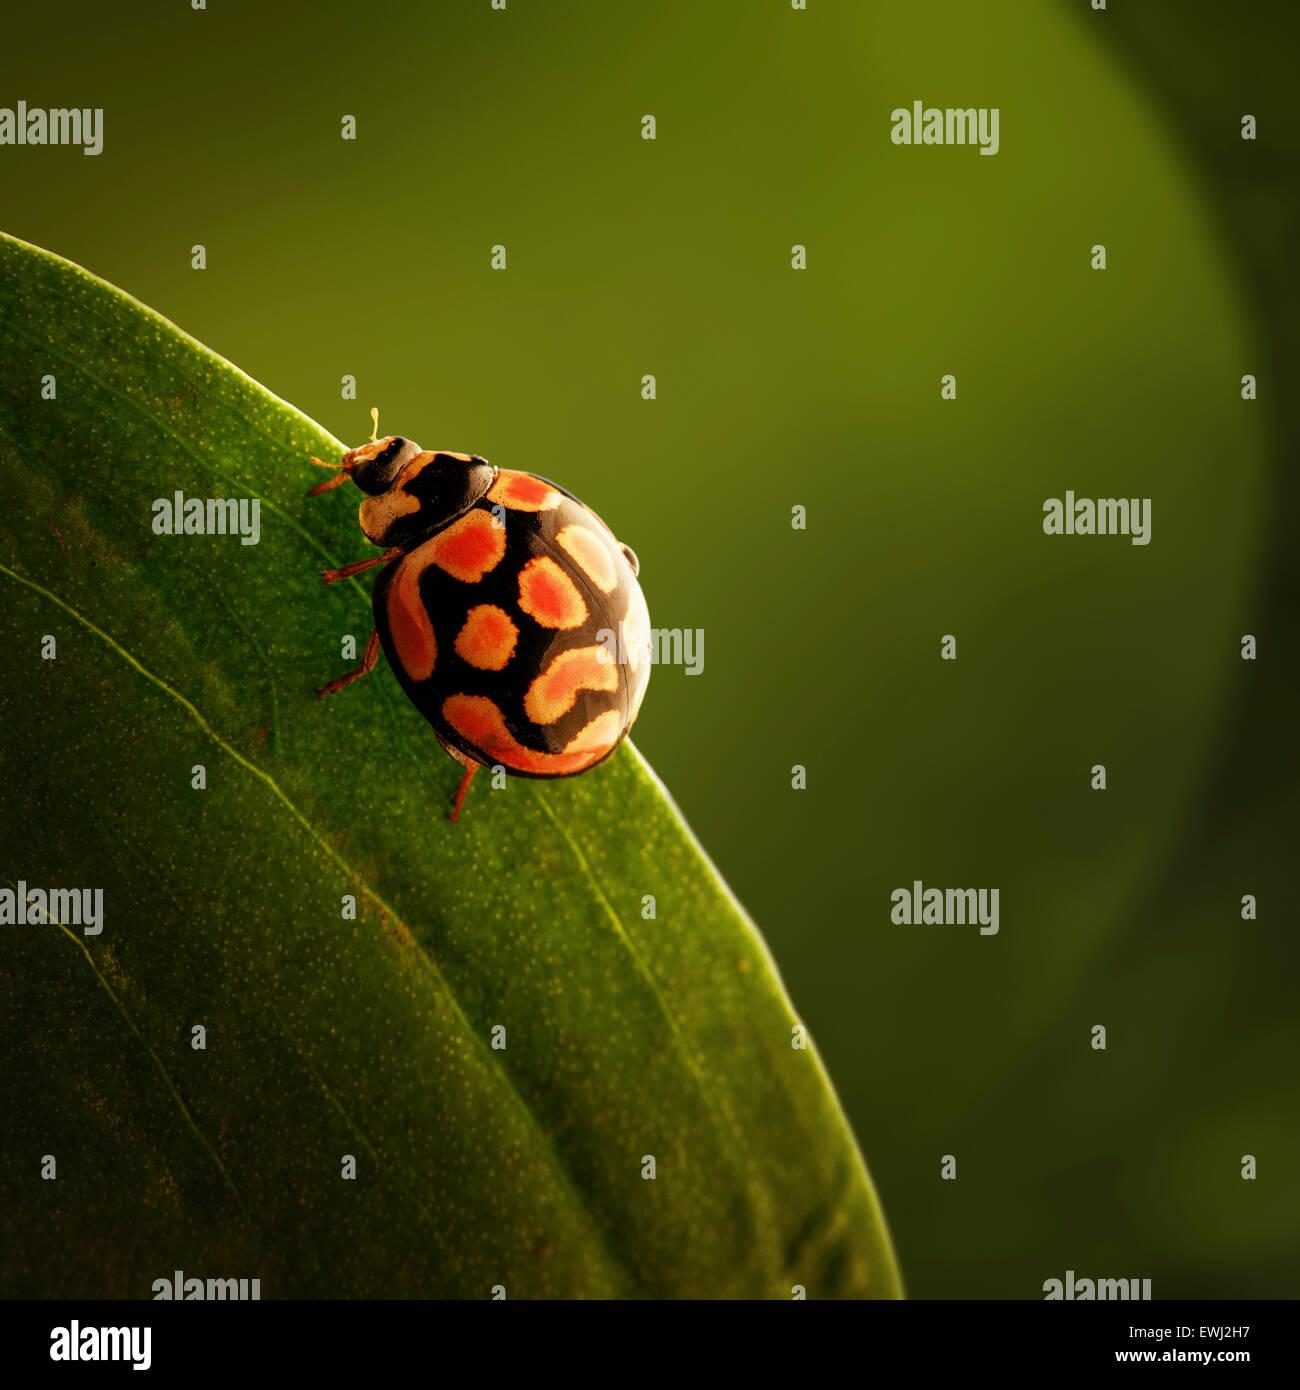 Ladybug (Marienkäfer) kriechen auf den Rand von einem grünen Blatt (Südafrika - Mpumalanga) Stockbild